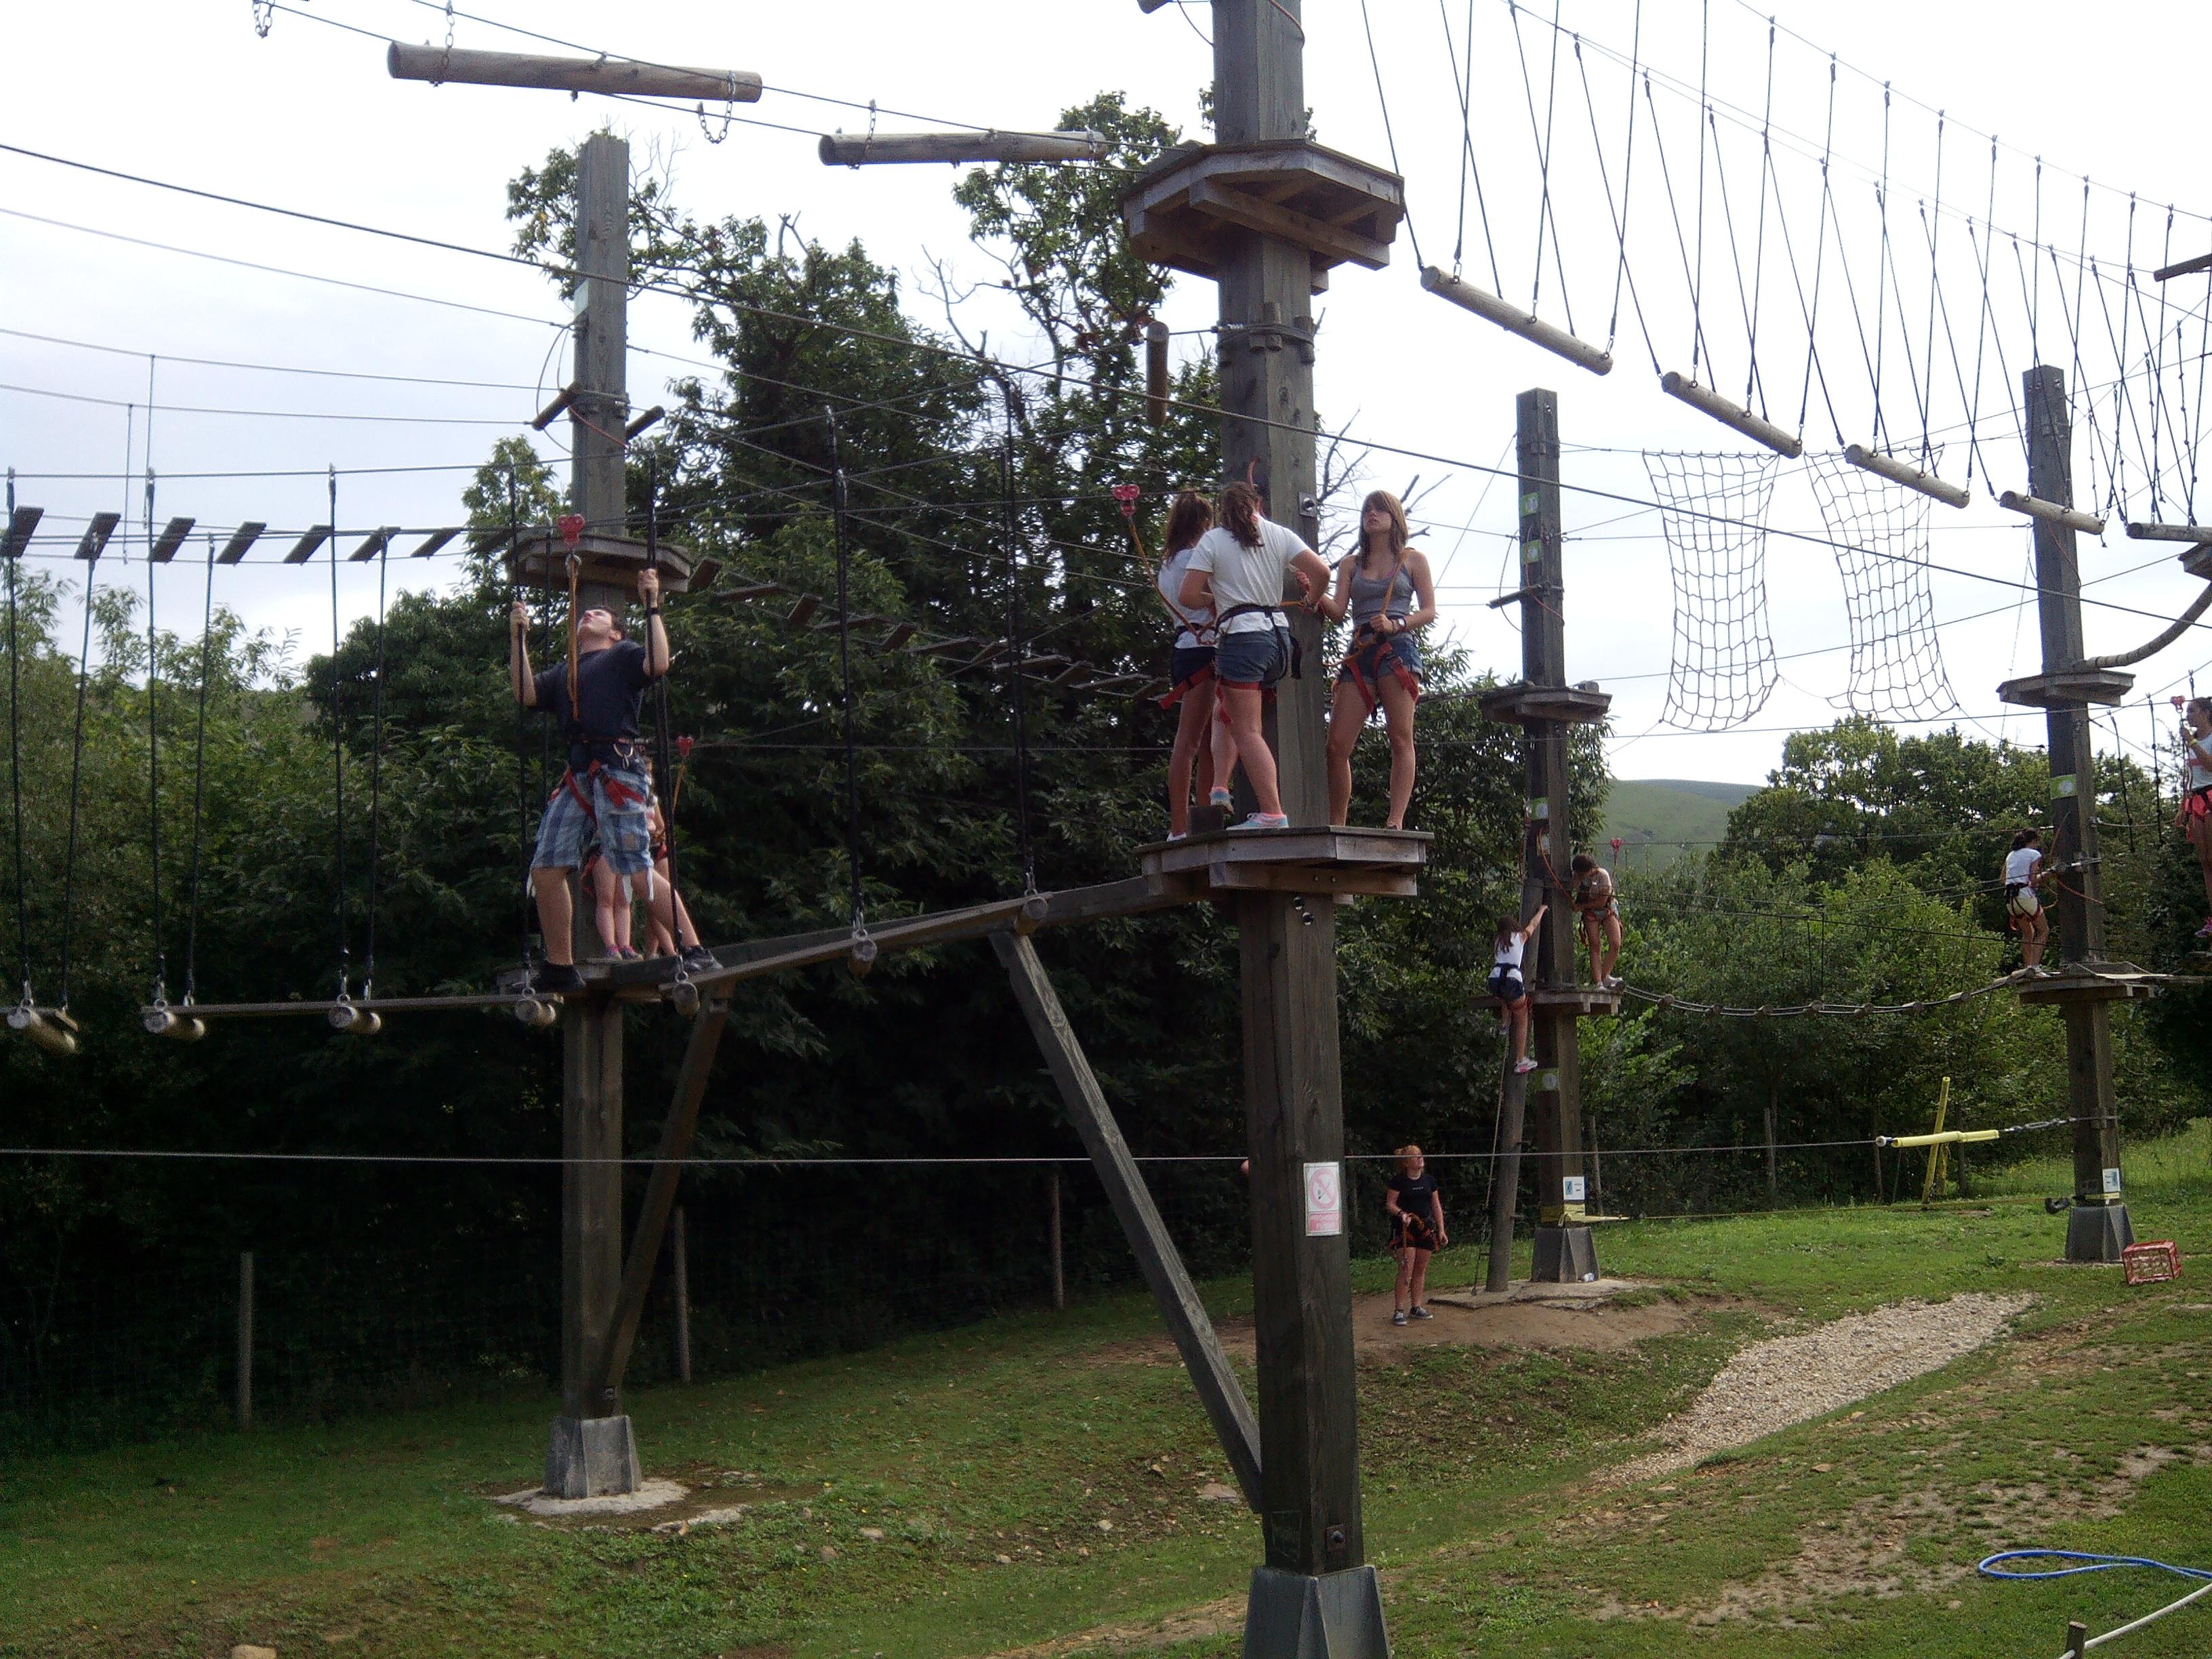 juegos_altura_tirolinas_5_Cantabria_Parque_multiaventura_ocio_juegos_cabuerniaventura